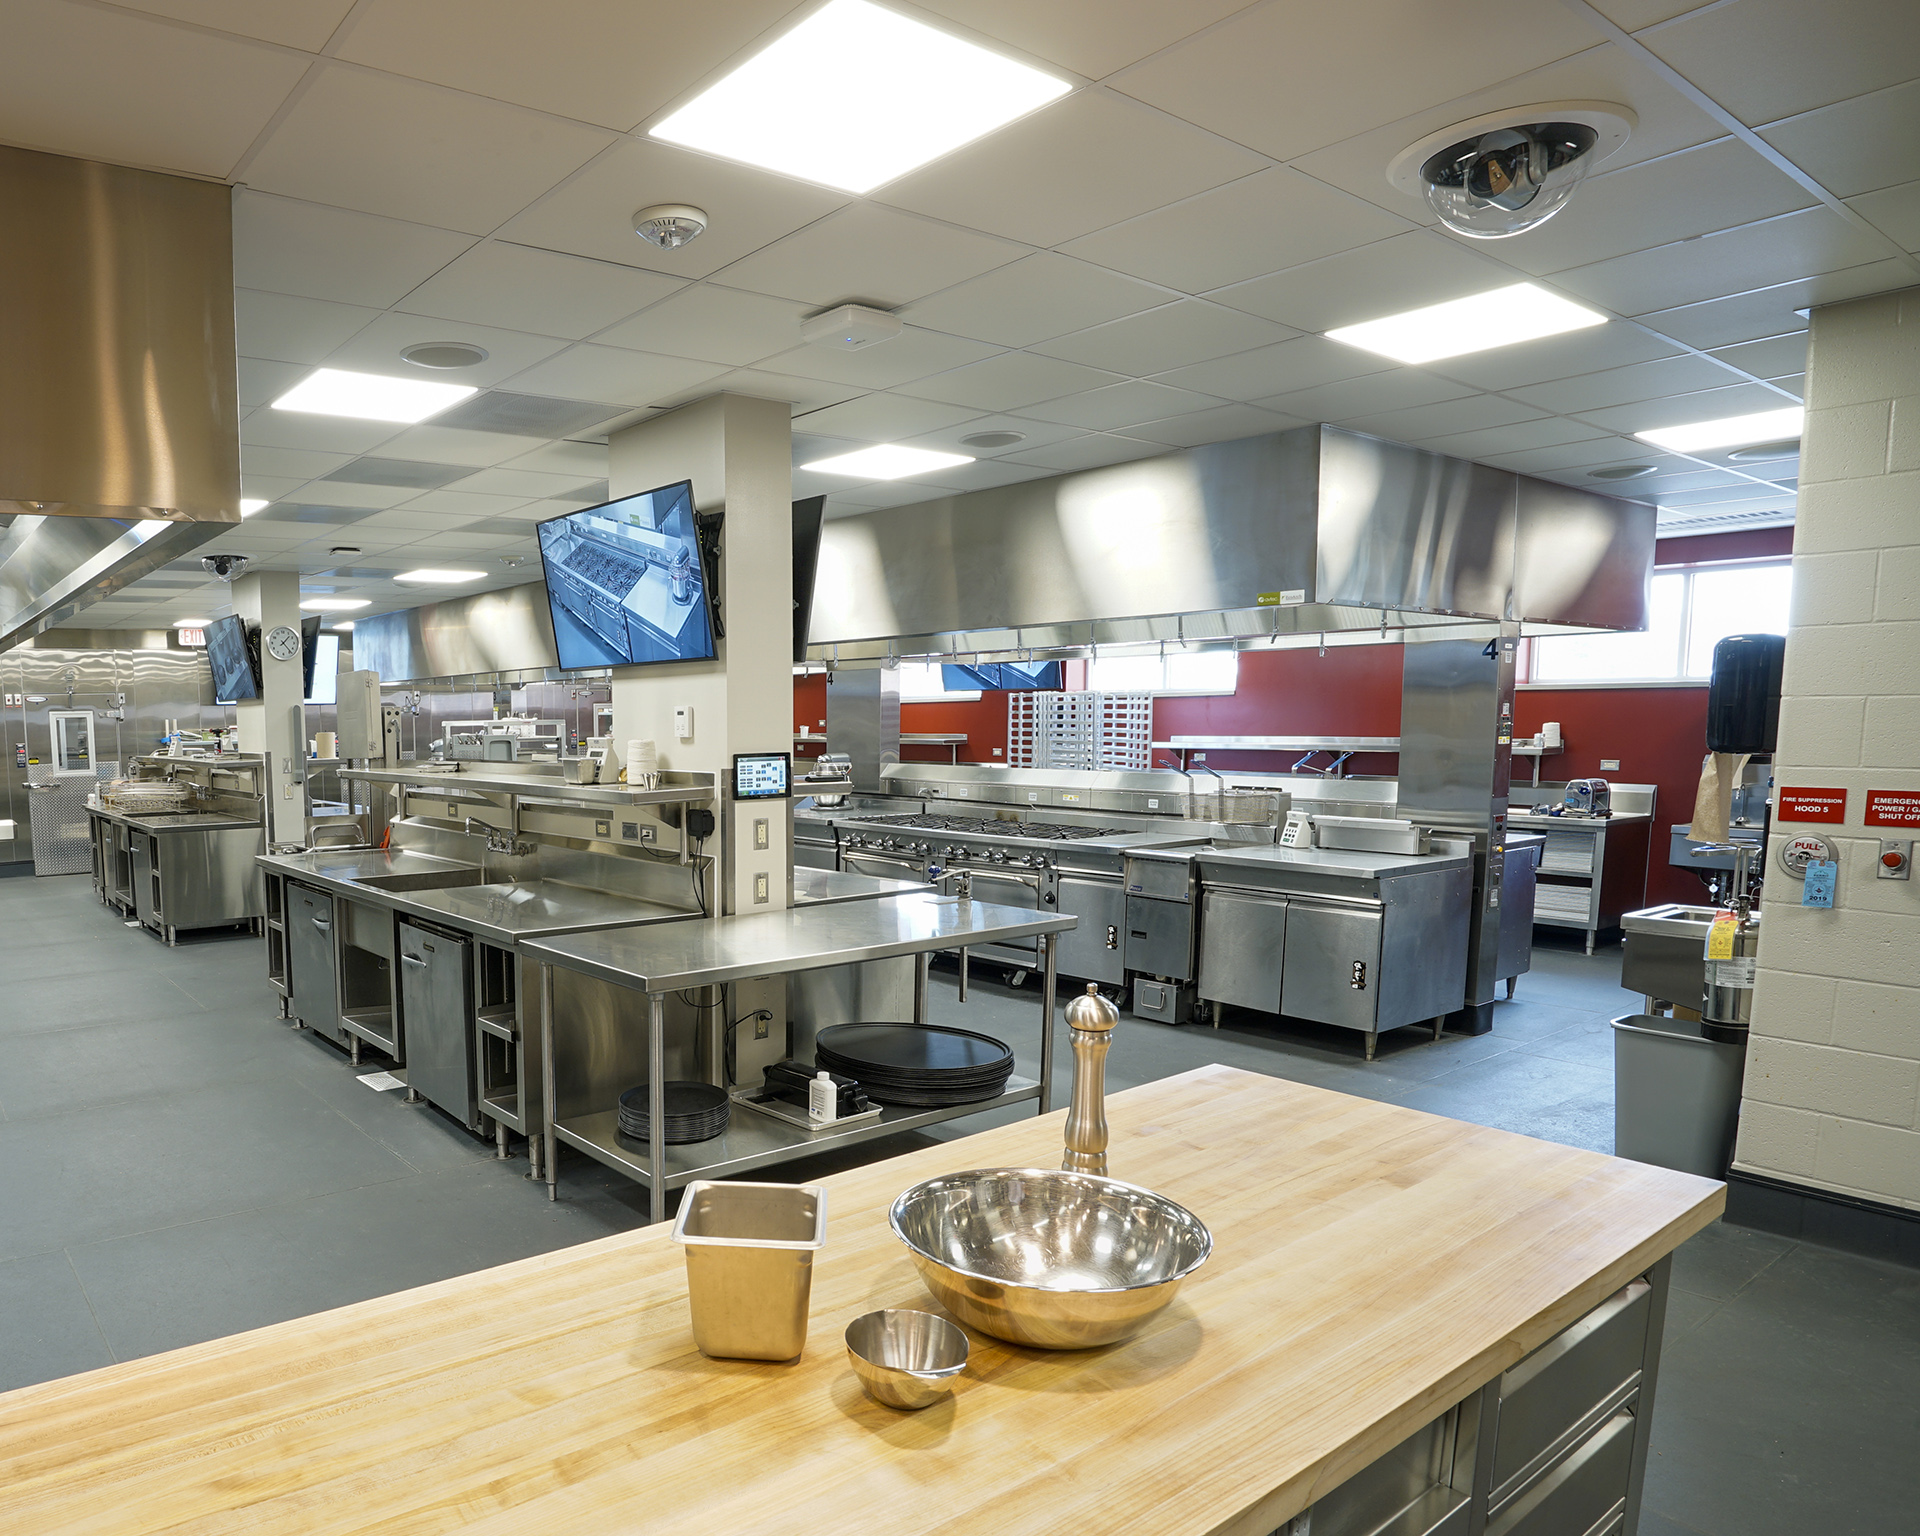 CVTC_Culinary Management Program_Case Study_2019_AVI Systems_In Body 2